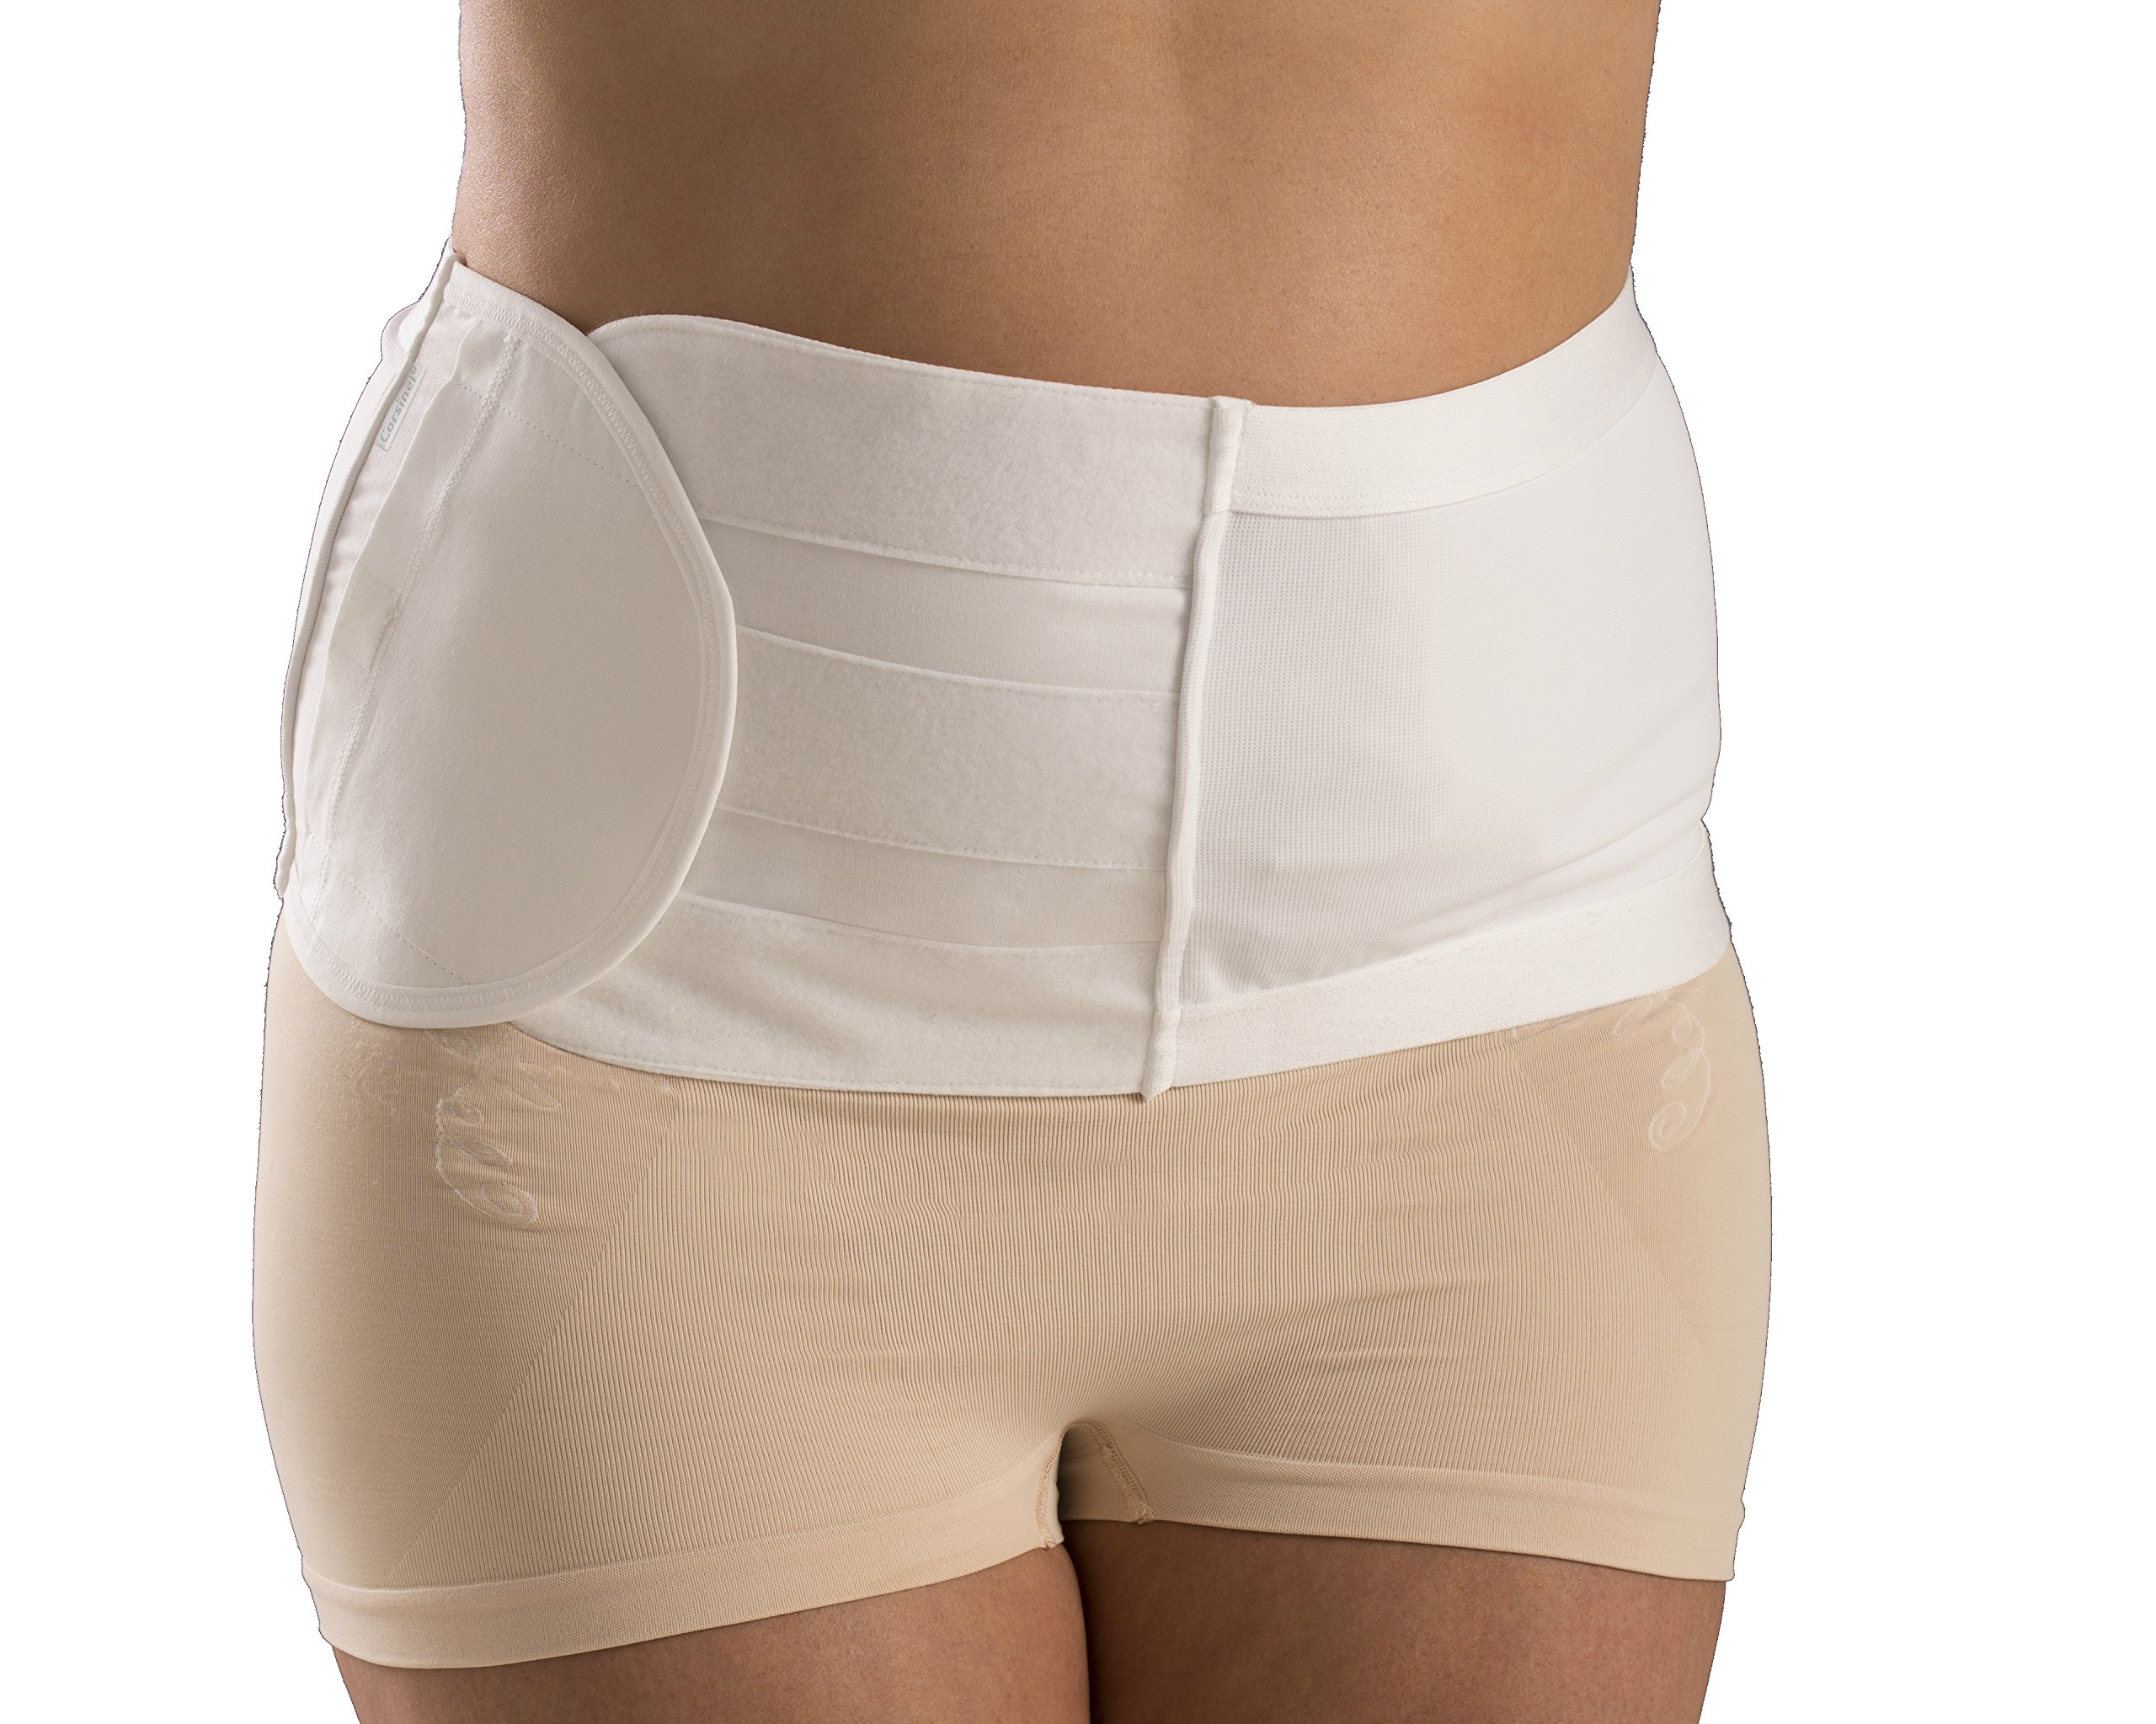 Corsinel Hernia Support Belt, 20 cm Tan 3519 (Tan, XL) by Corsinel